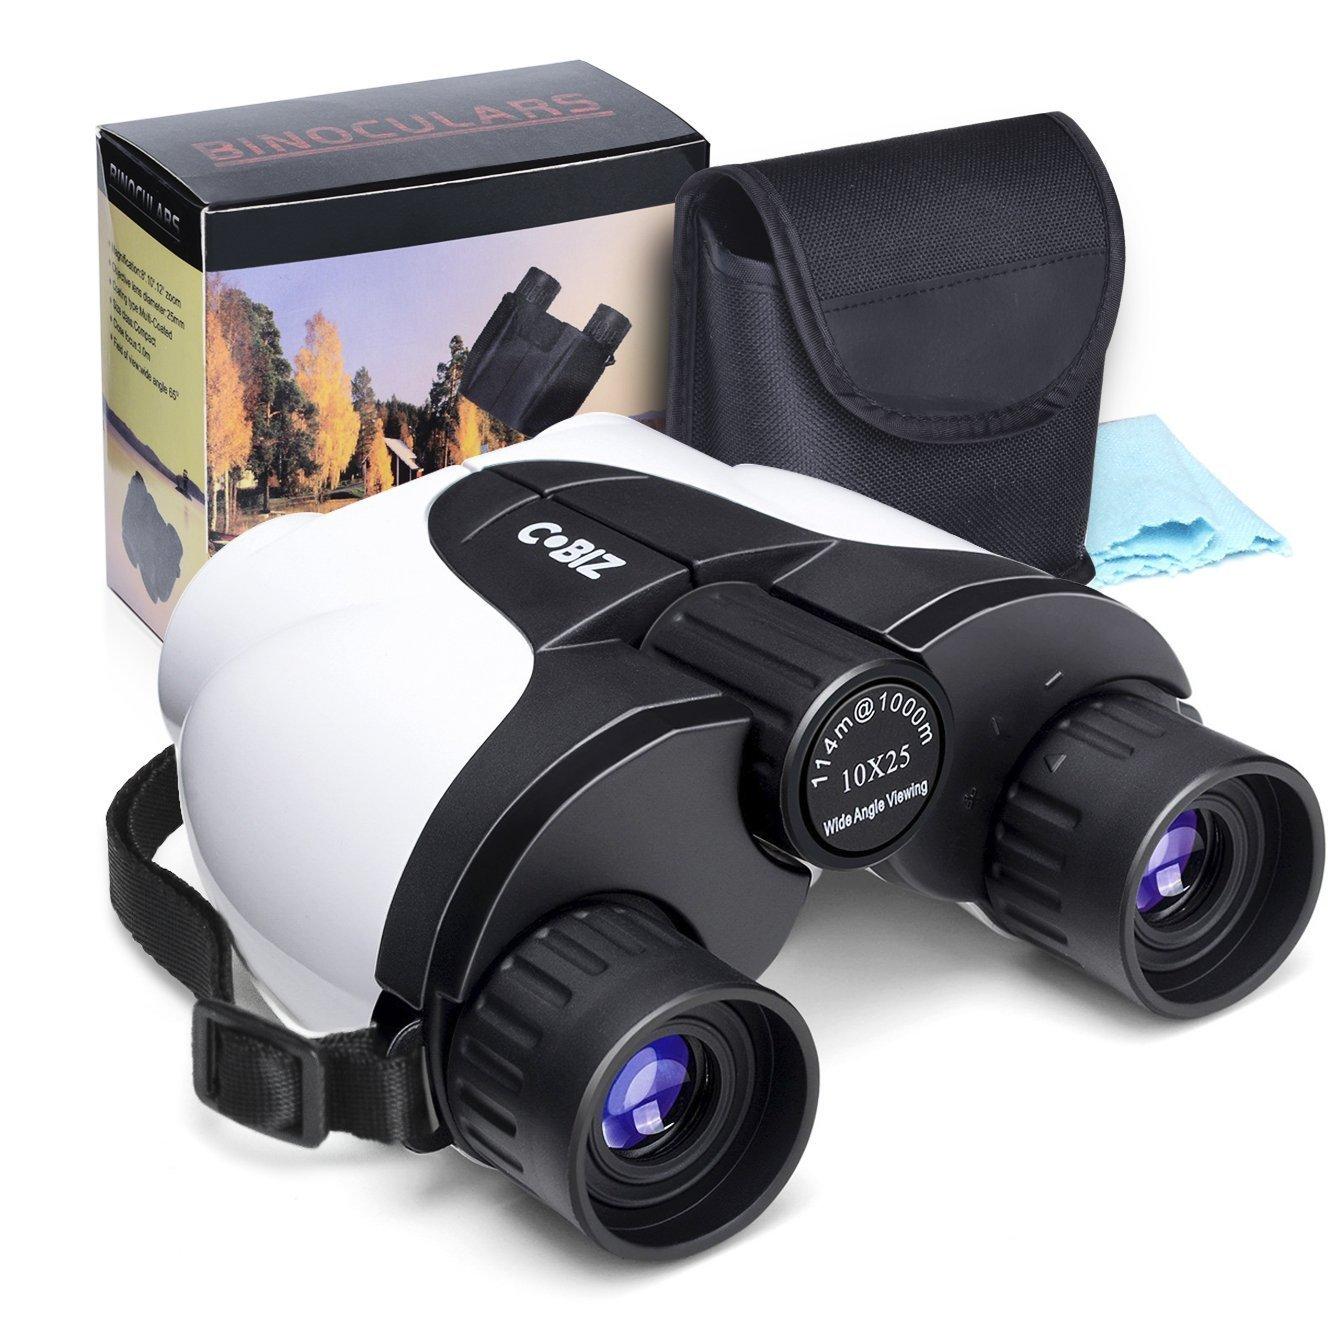 20% OFF - 10x25 Outdoor Binoculars for Kids with F/S - $19.99 $19.19